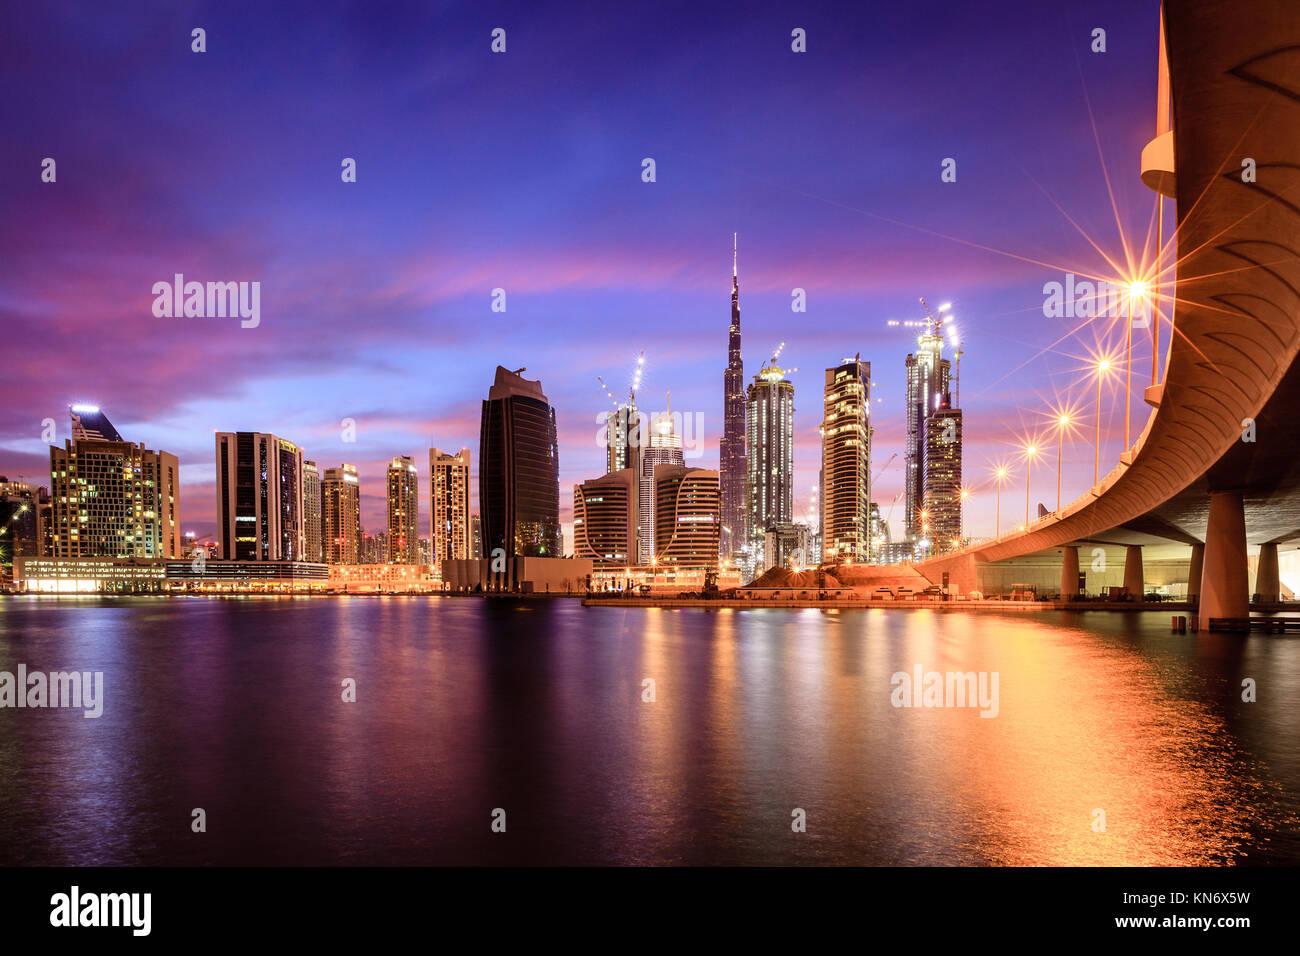 Vue sur Dubai downtown skyline at night Photo Stock